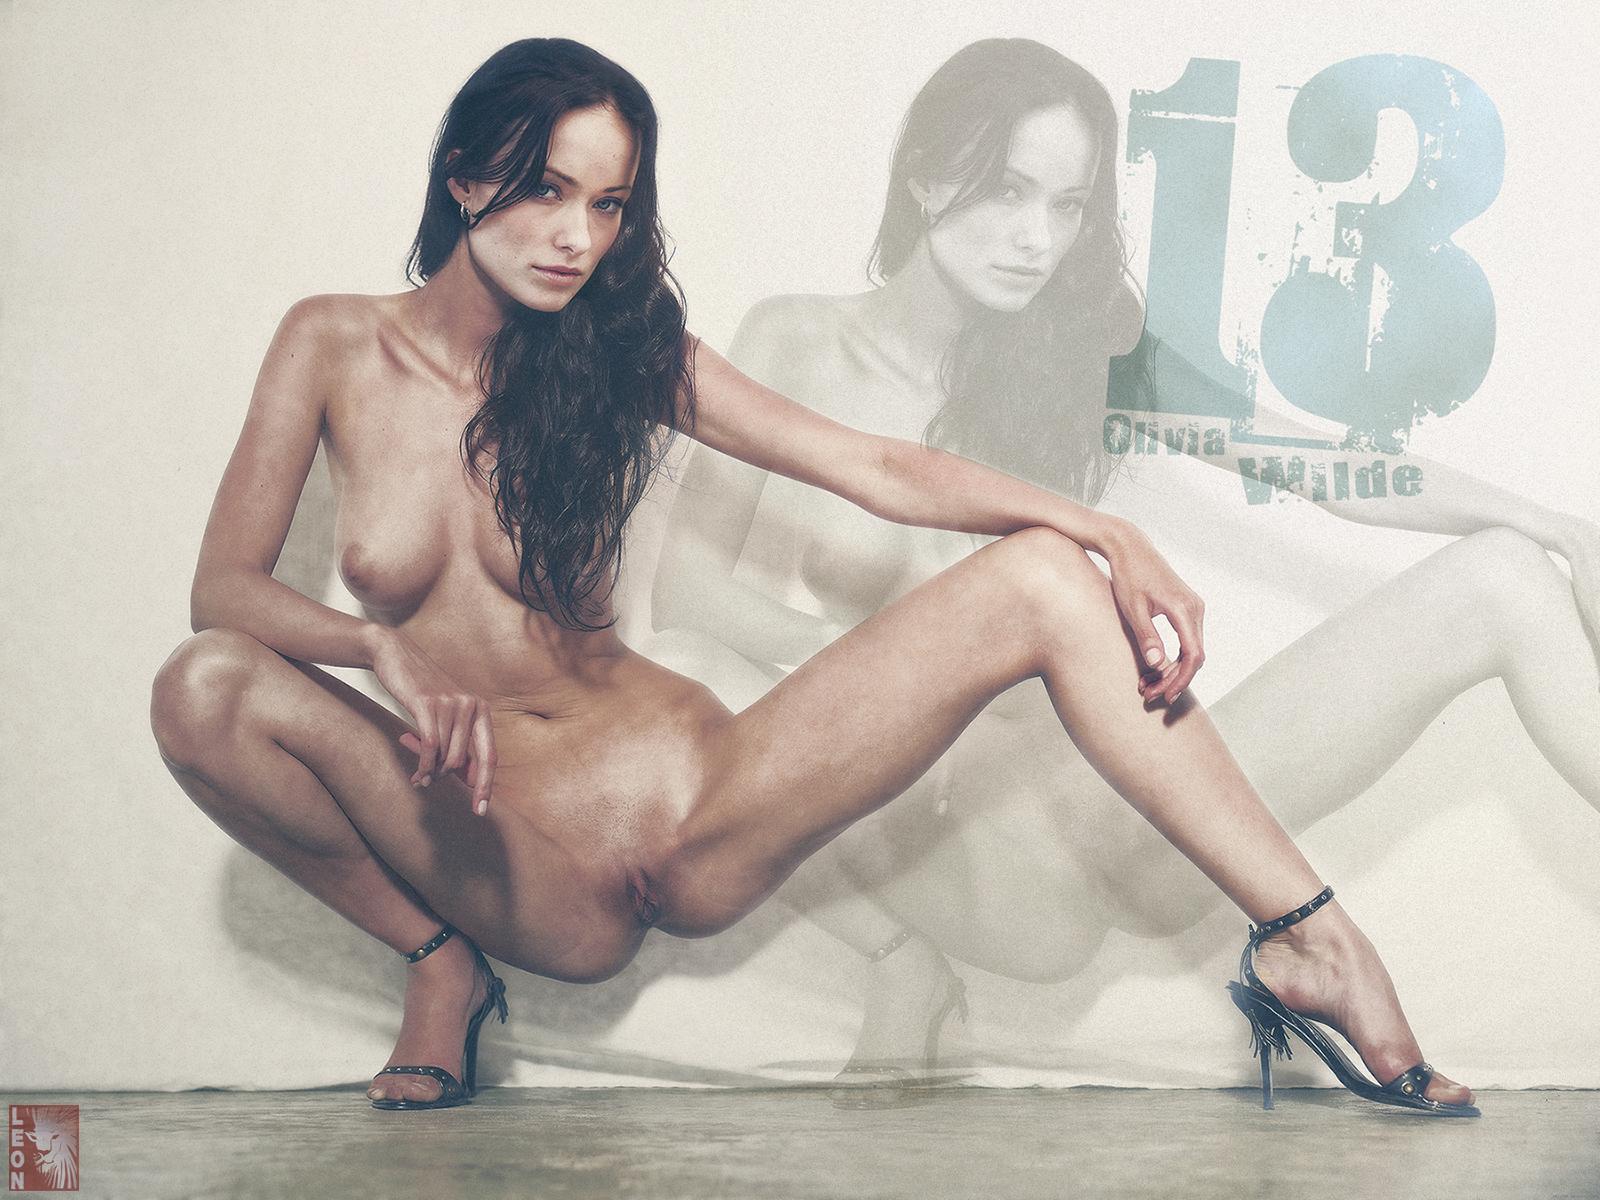 Olivia black nude blowjob leaked porn photo